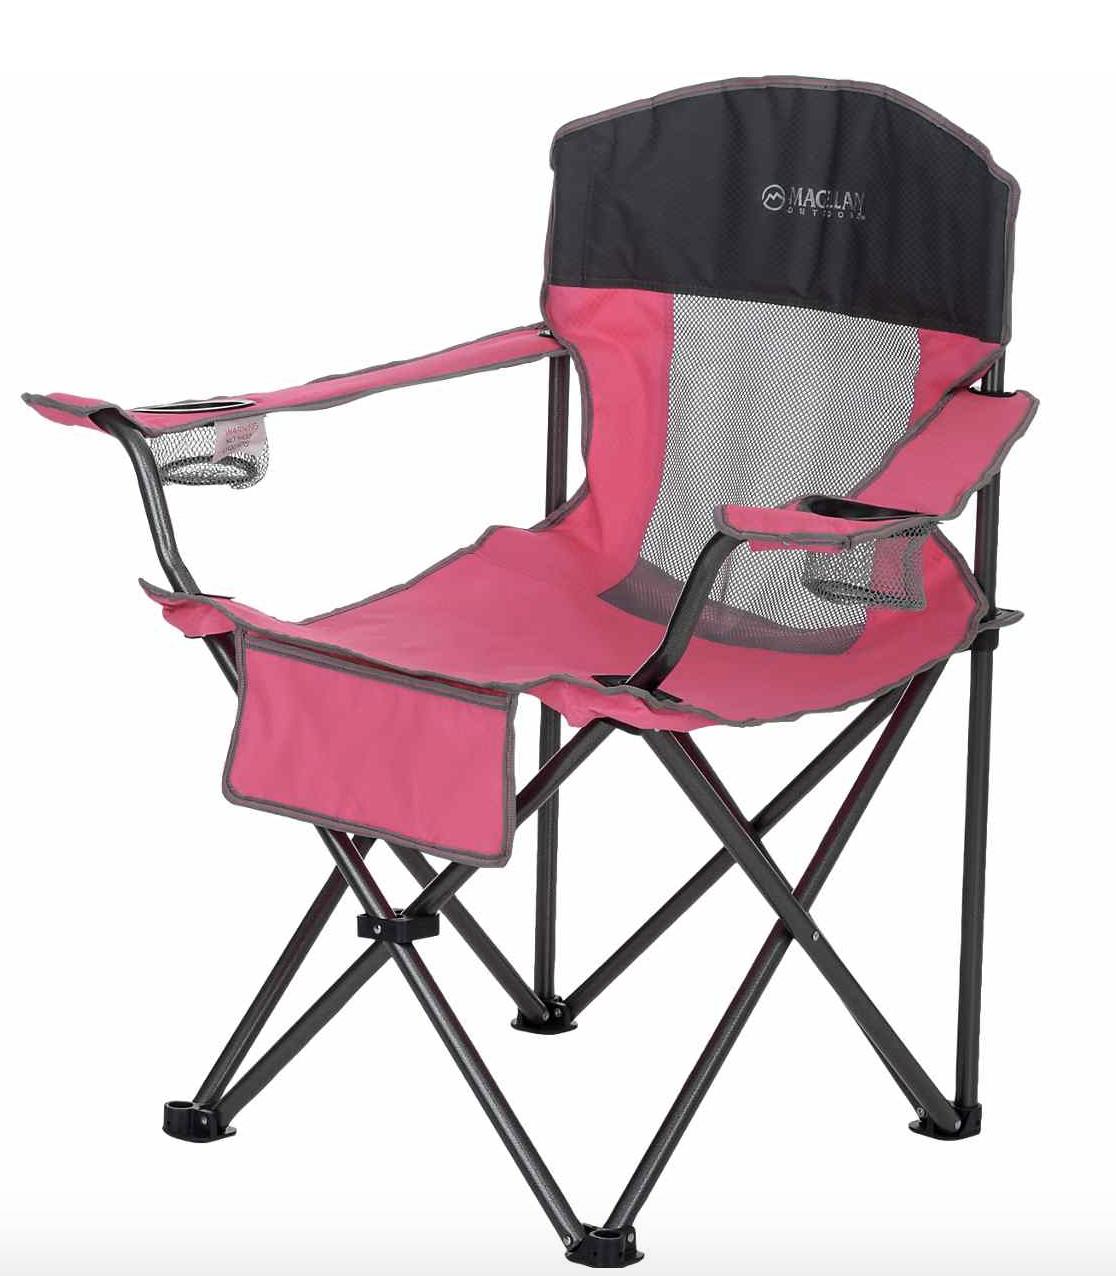 Magellan Outdoors Big Comfort Mesh Chair Affiliate Link This